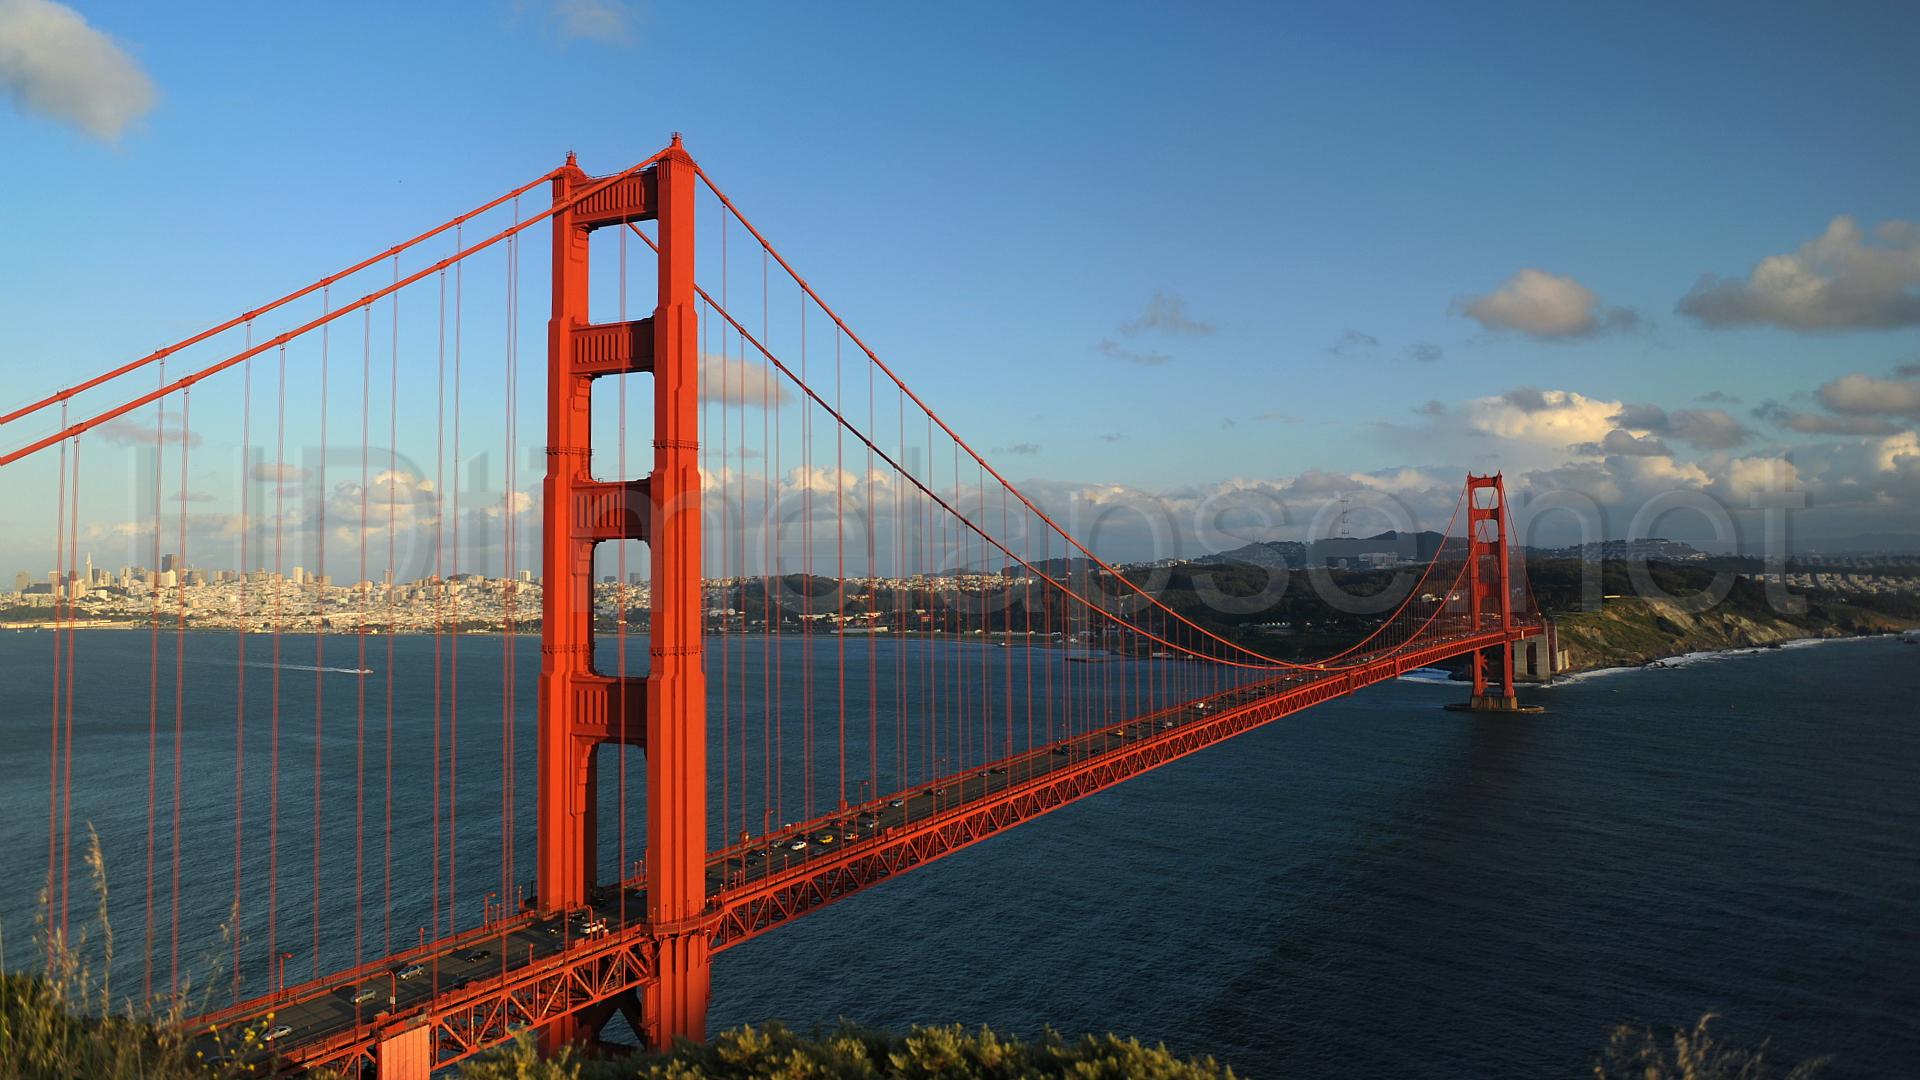 Golden Gate Bridge 4k: Golden Gate Bridge Wallpapers High Quality